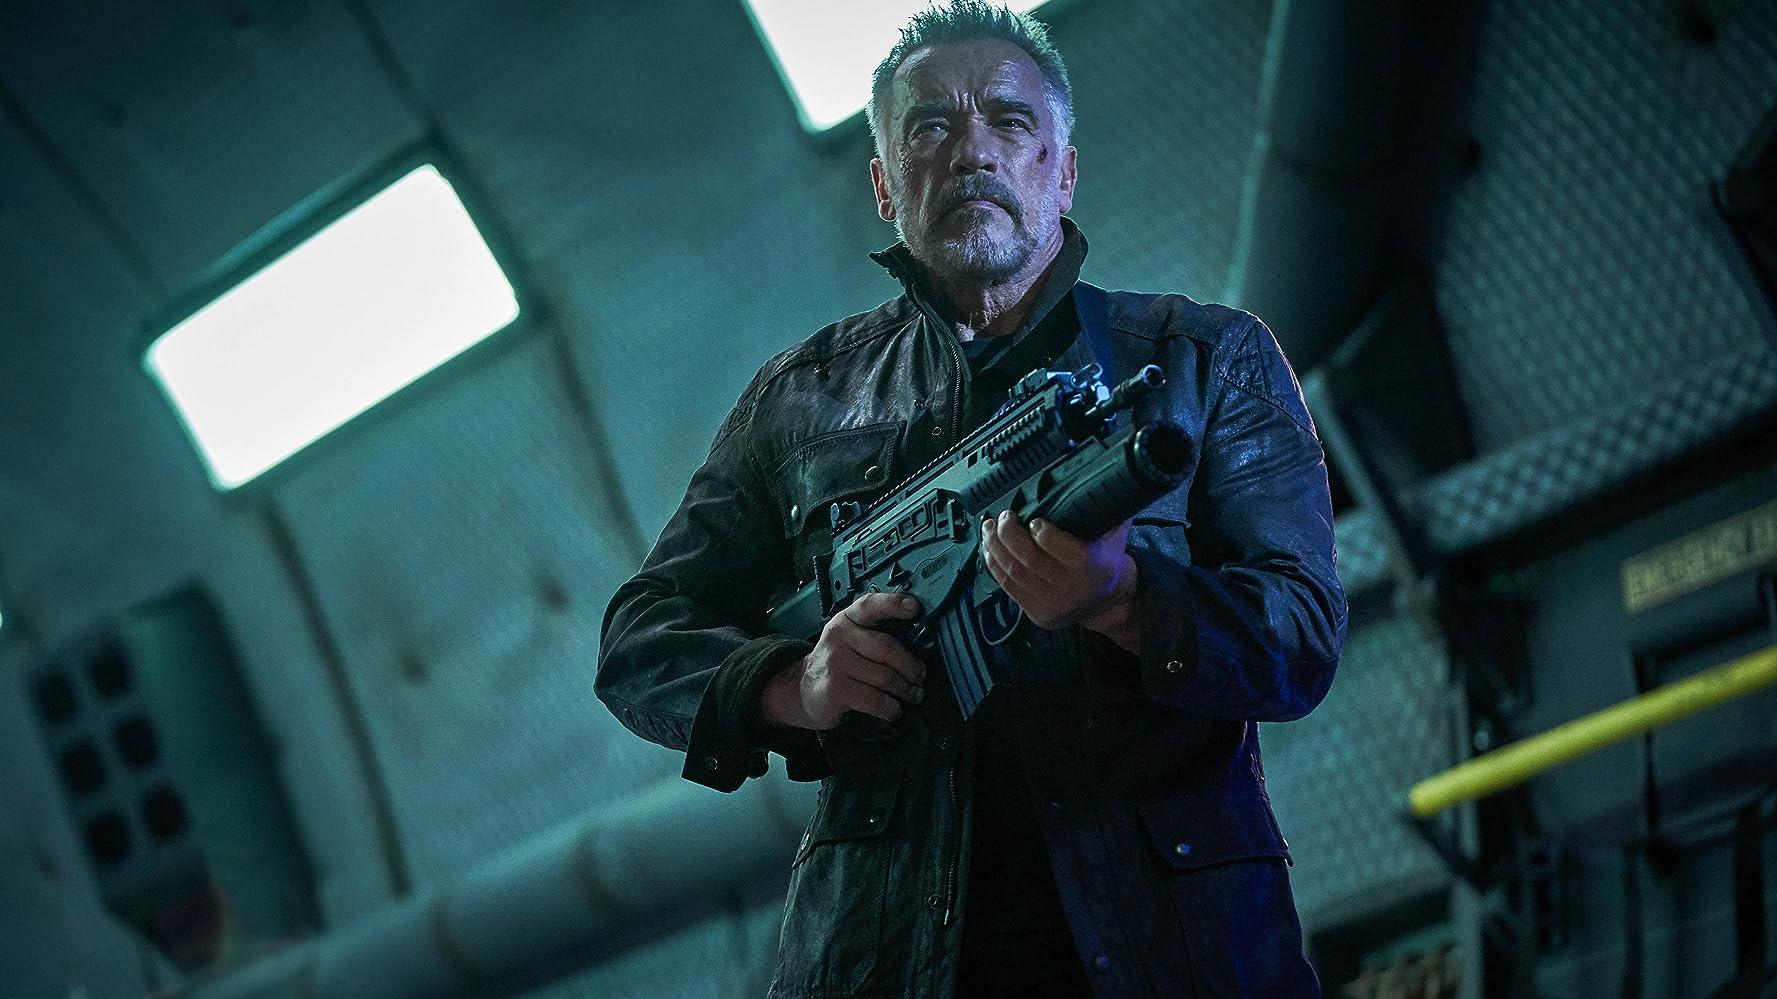 Arnold Schwarzenegger in Terminator: Dark Fate (2019)